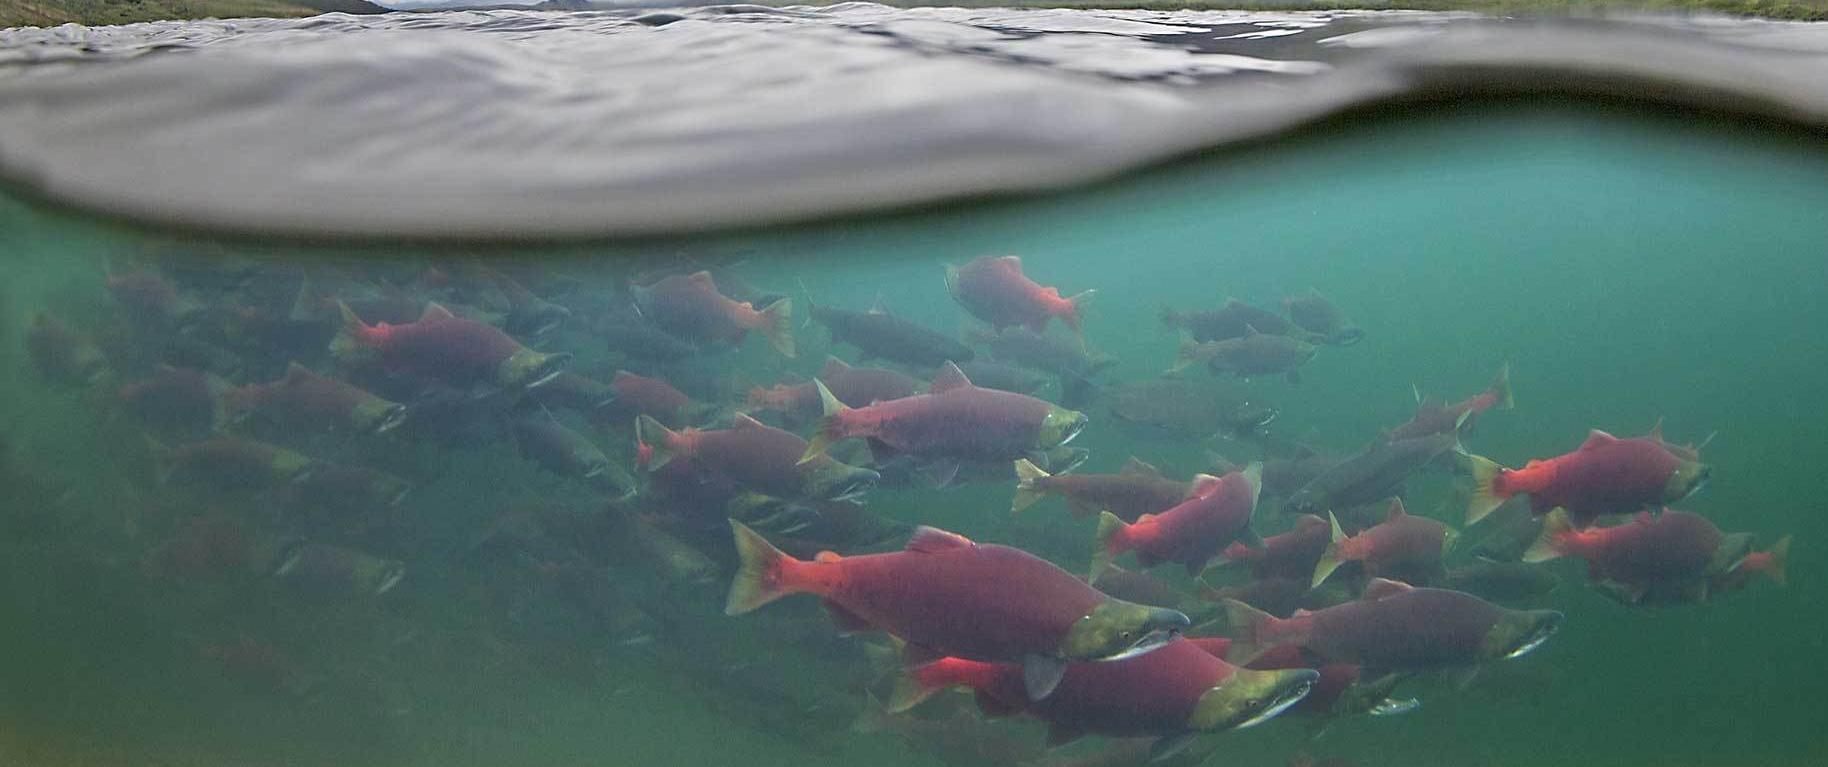 banner-salmon-meaning.jpg